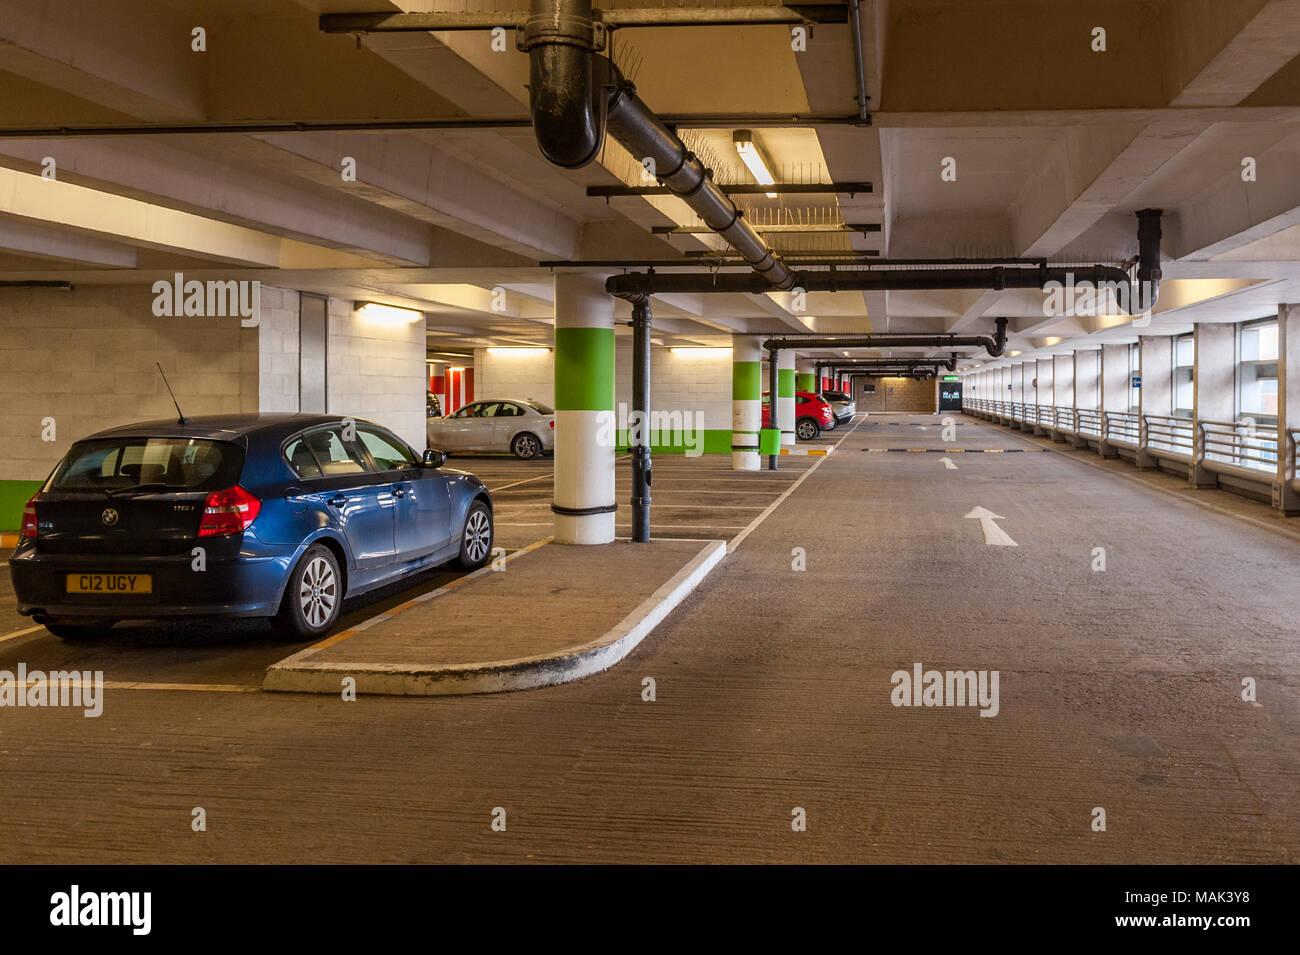 Prince Bishops Shopping Centre Car Park